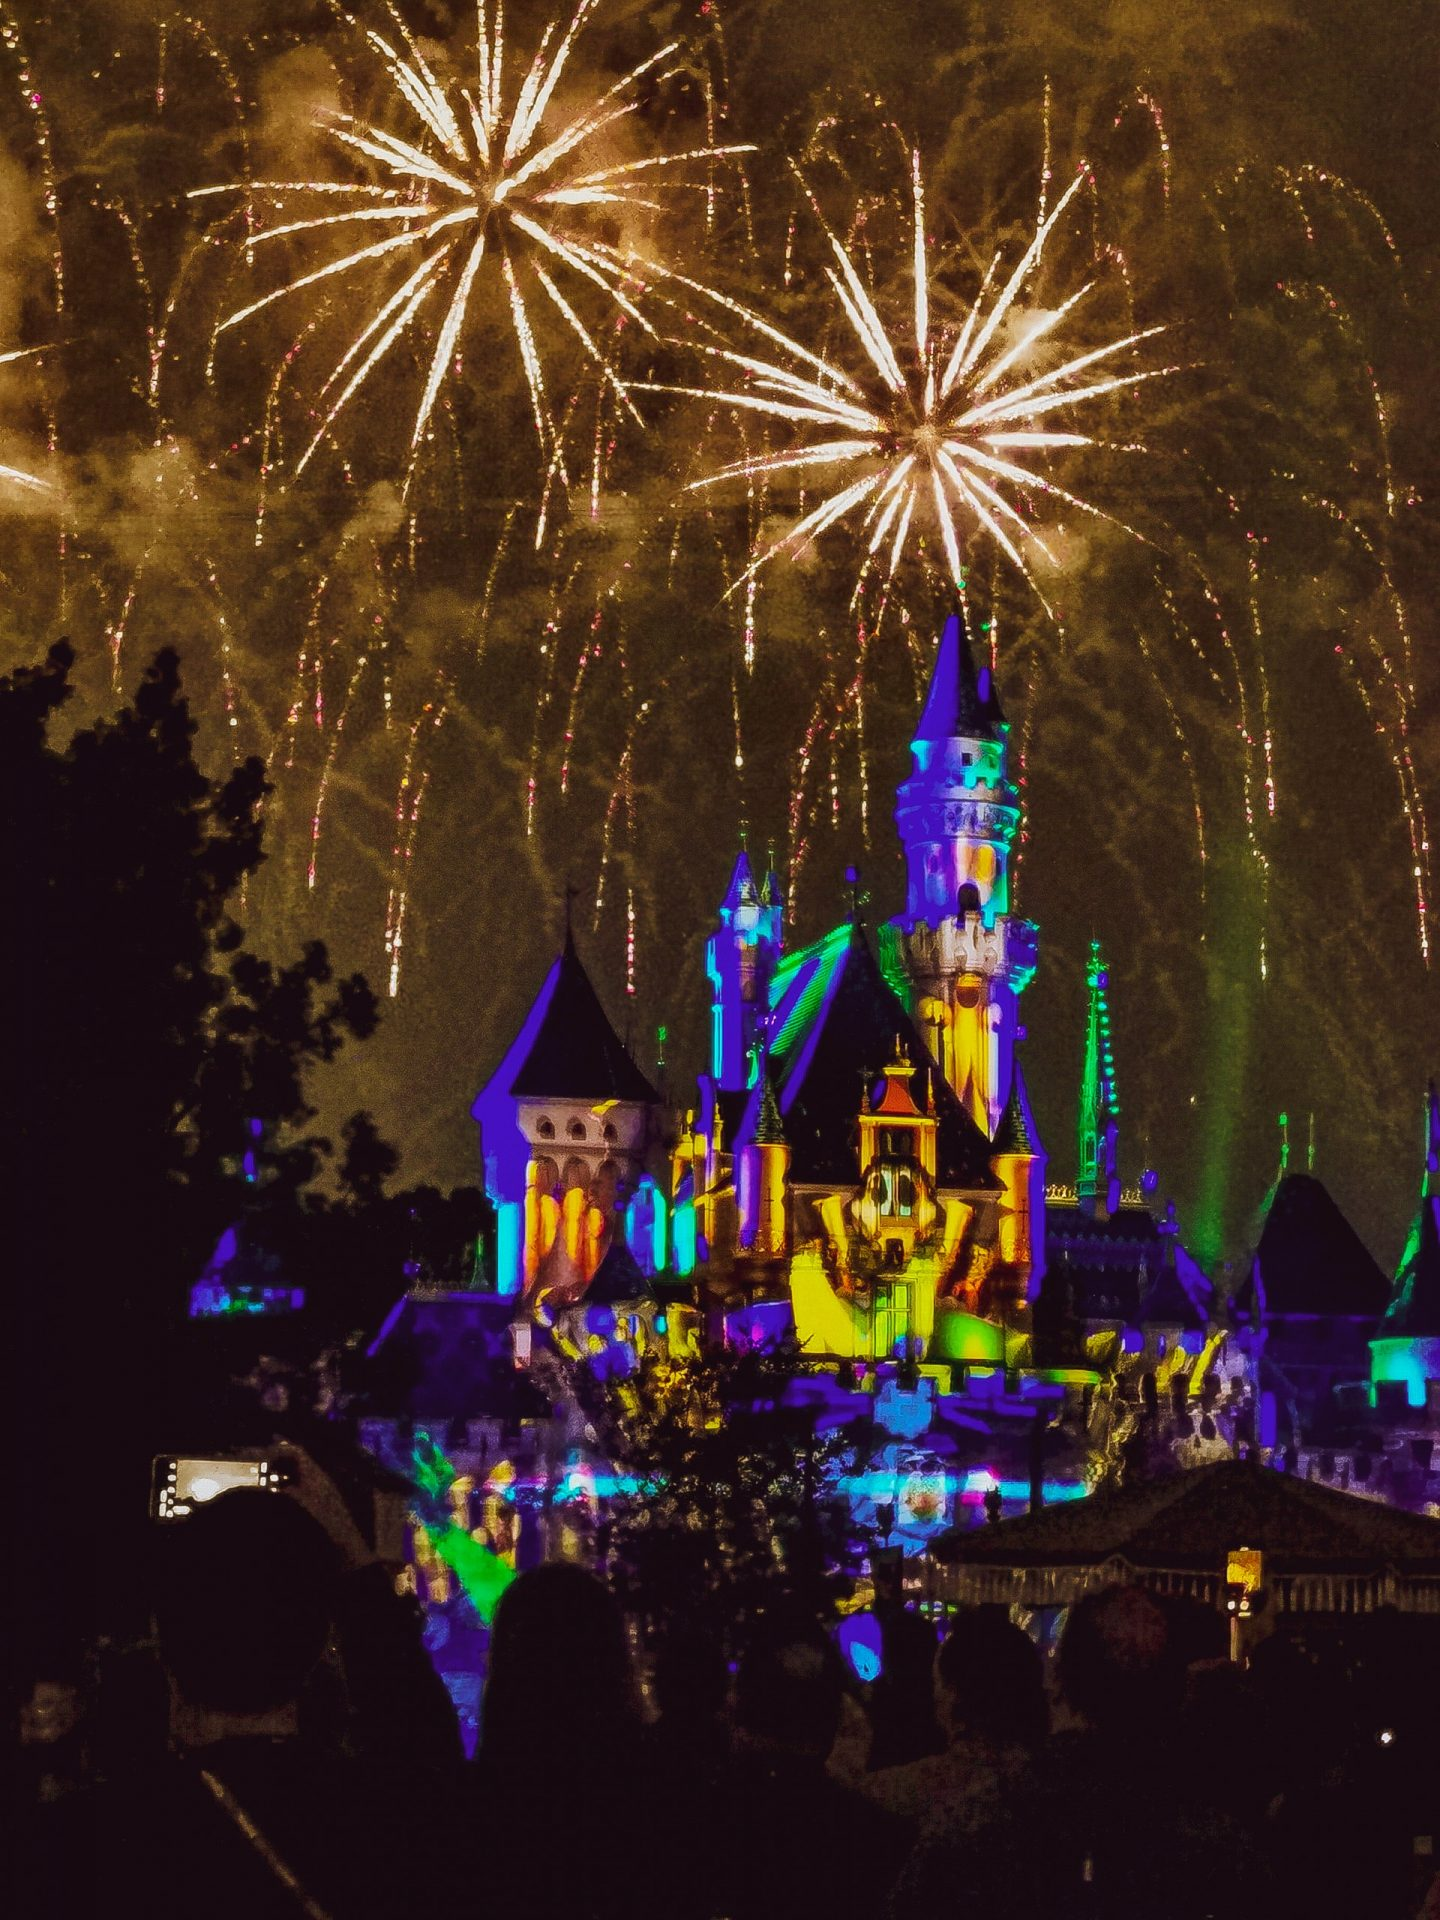 Disneyland LA Tara Povey 5 days in LA Los Angeles itinerary 4